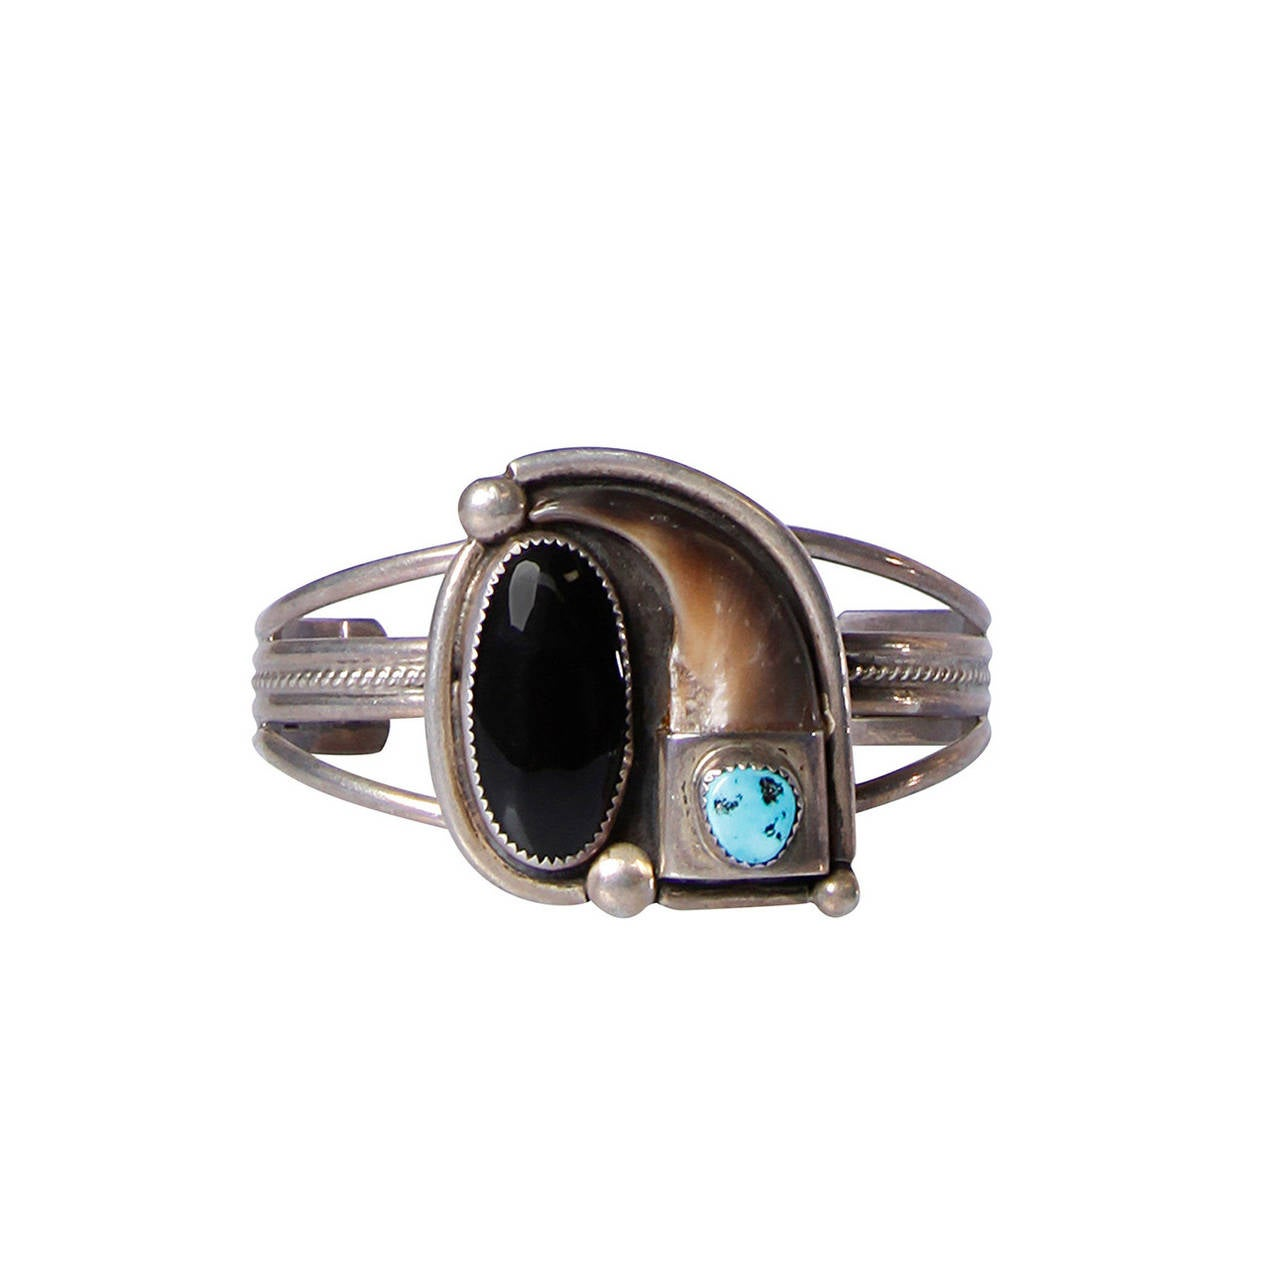 Signed Lutz Whitebird Cherokee Bear Claw, Turquoise + Sterling Cuff Bracelet 1